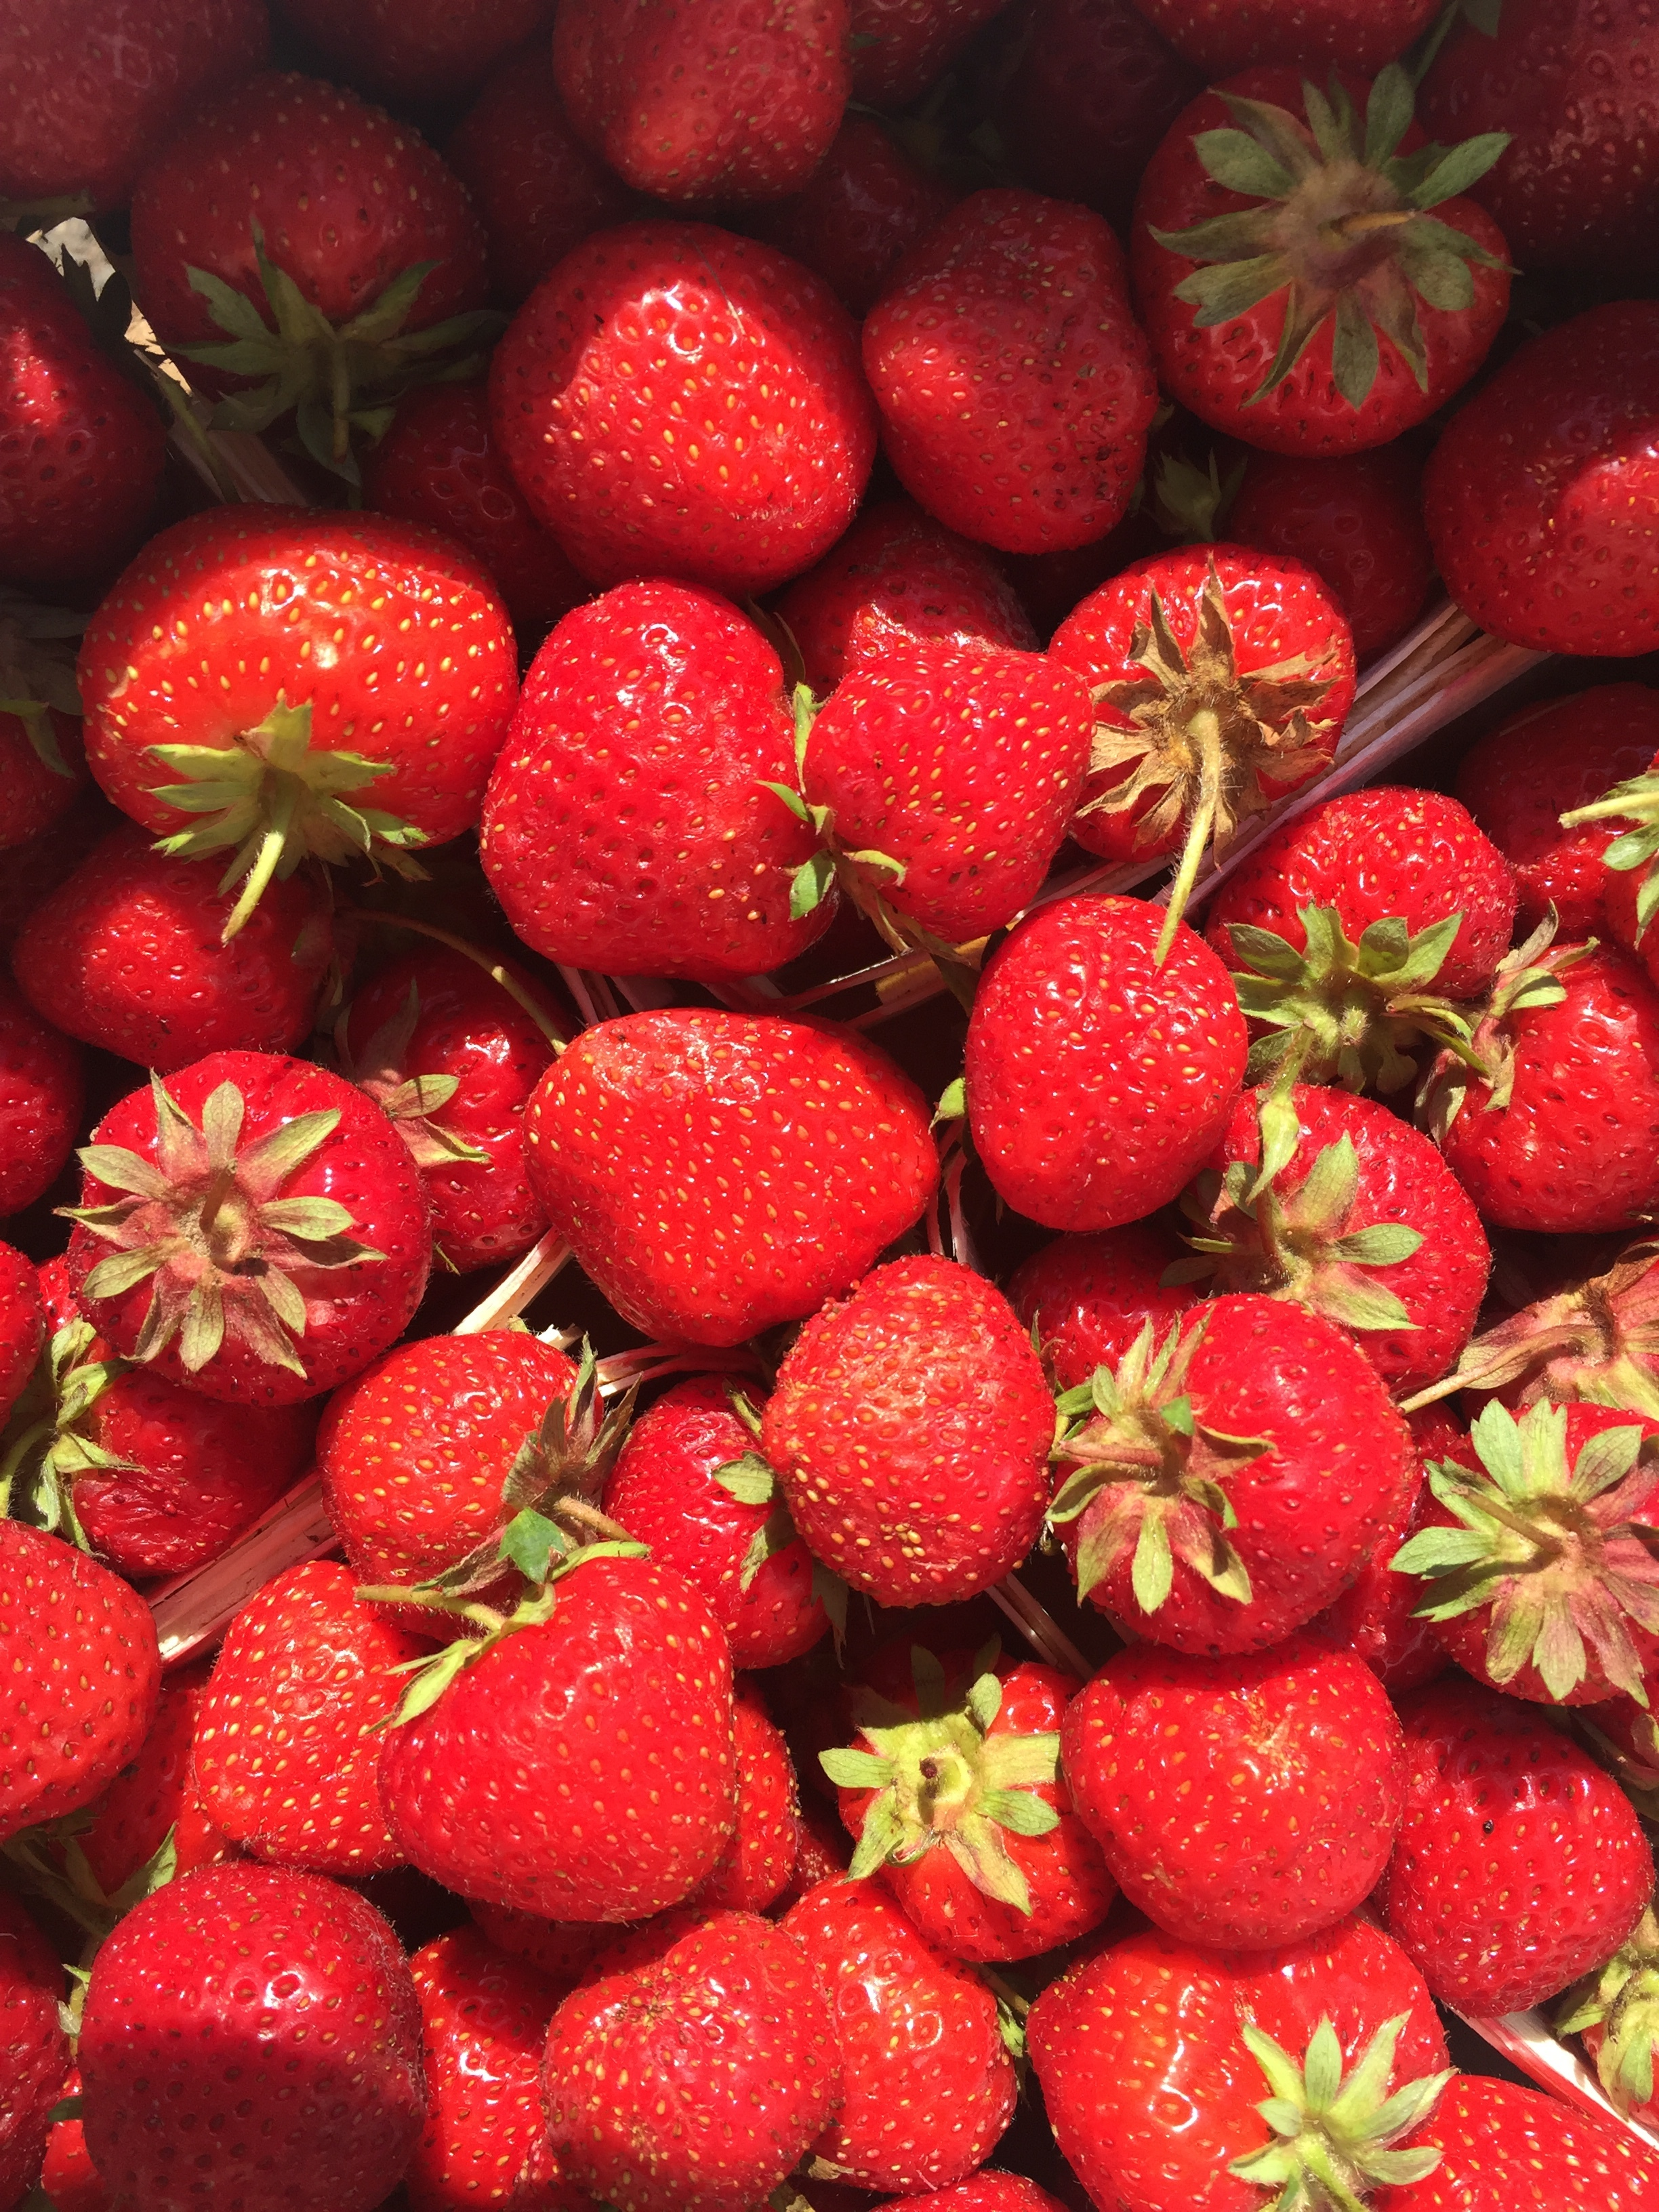 Fresh strawberries grown in Glastonbury, CT.